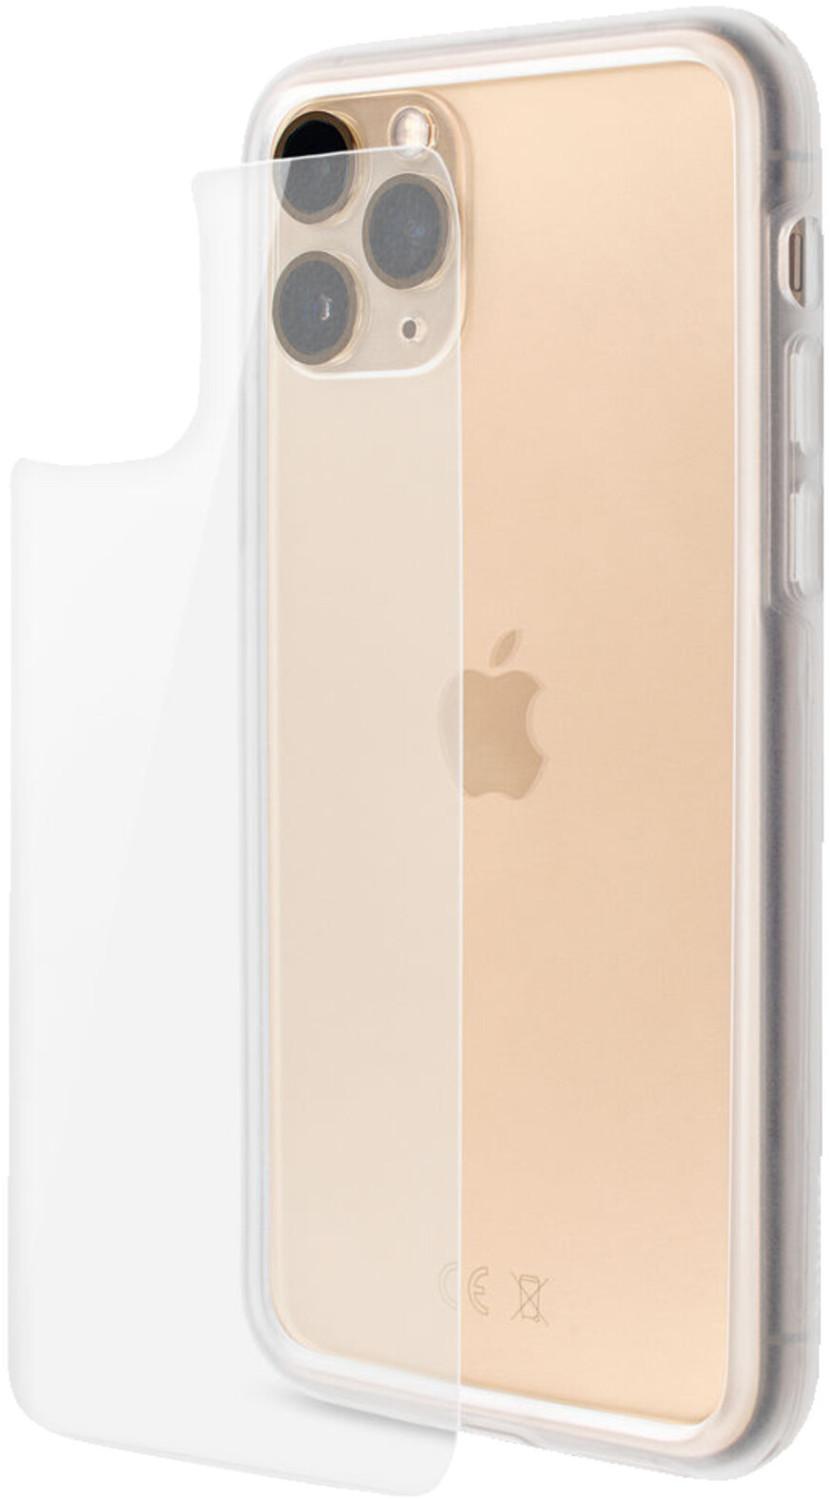 Image of Artwizz Bumper + SecondBack (iPhone 11 Pro) Clear